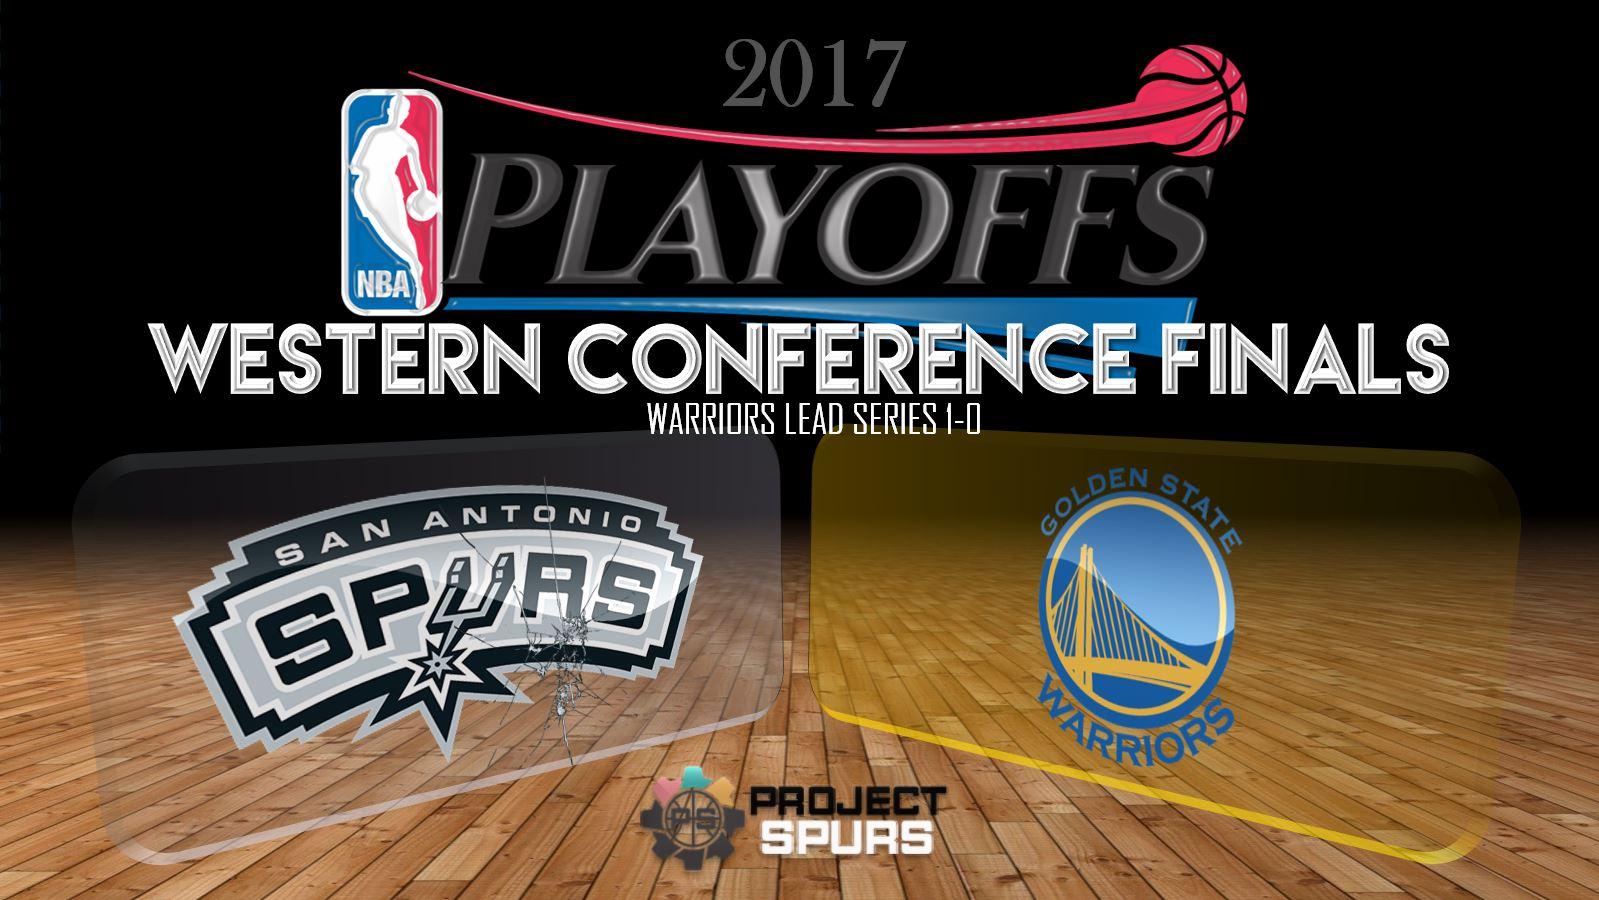 Game 1 Vidcast: Warriors 113, Spurs 111